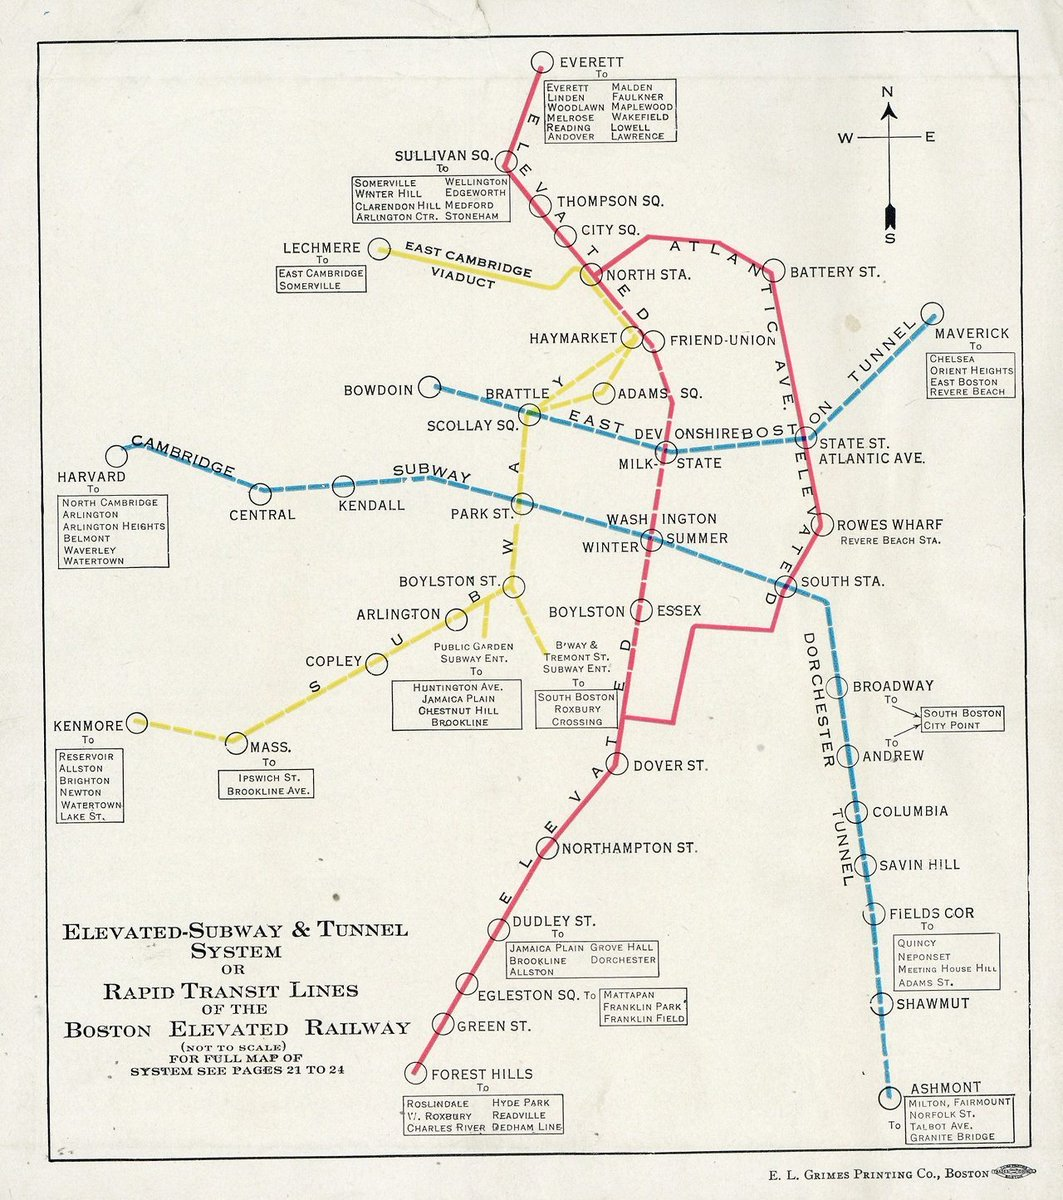 Mbta Subway Map Boston Ma.Bostontweet On Twitter Map Of Boston S Mbta Subway System From